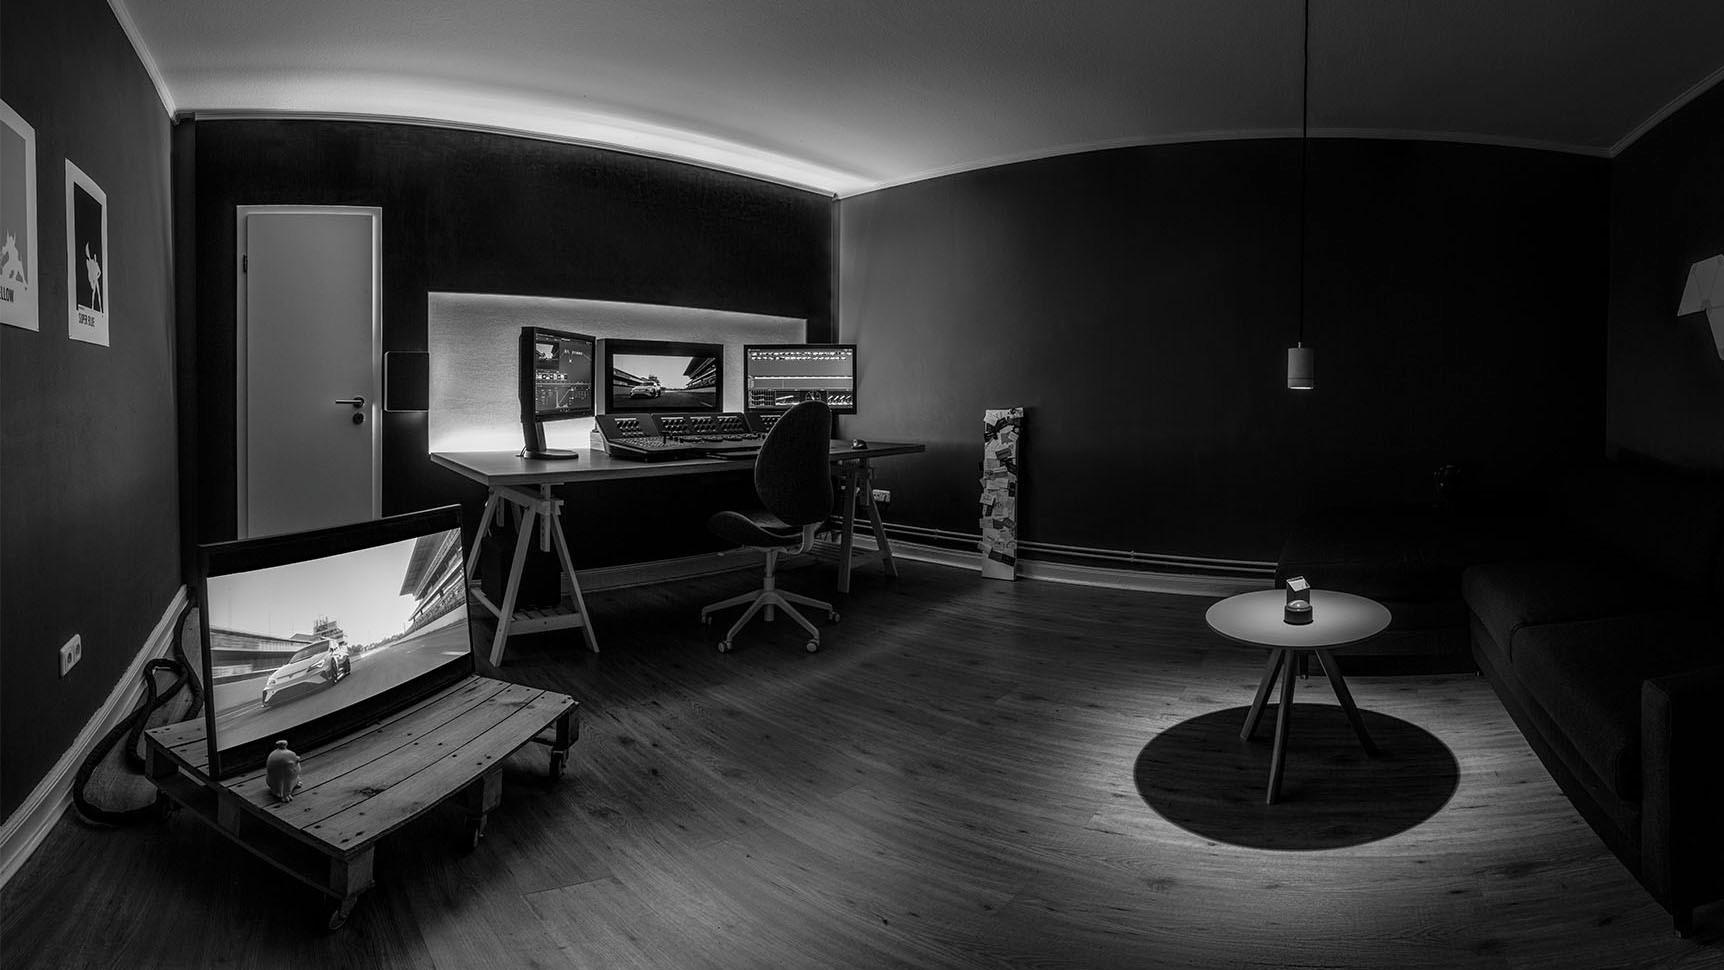 Hamburg  Schnittstudio Color Grading / Finishing Suite image 4